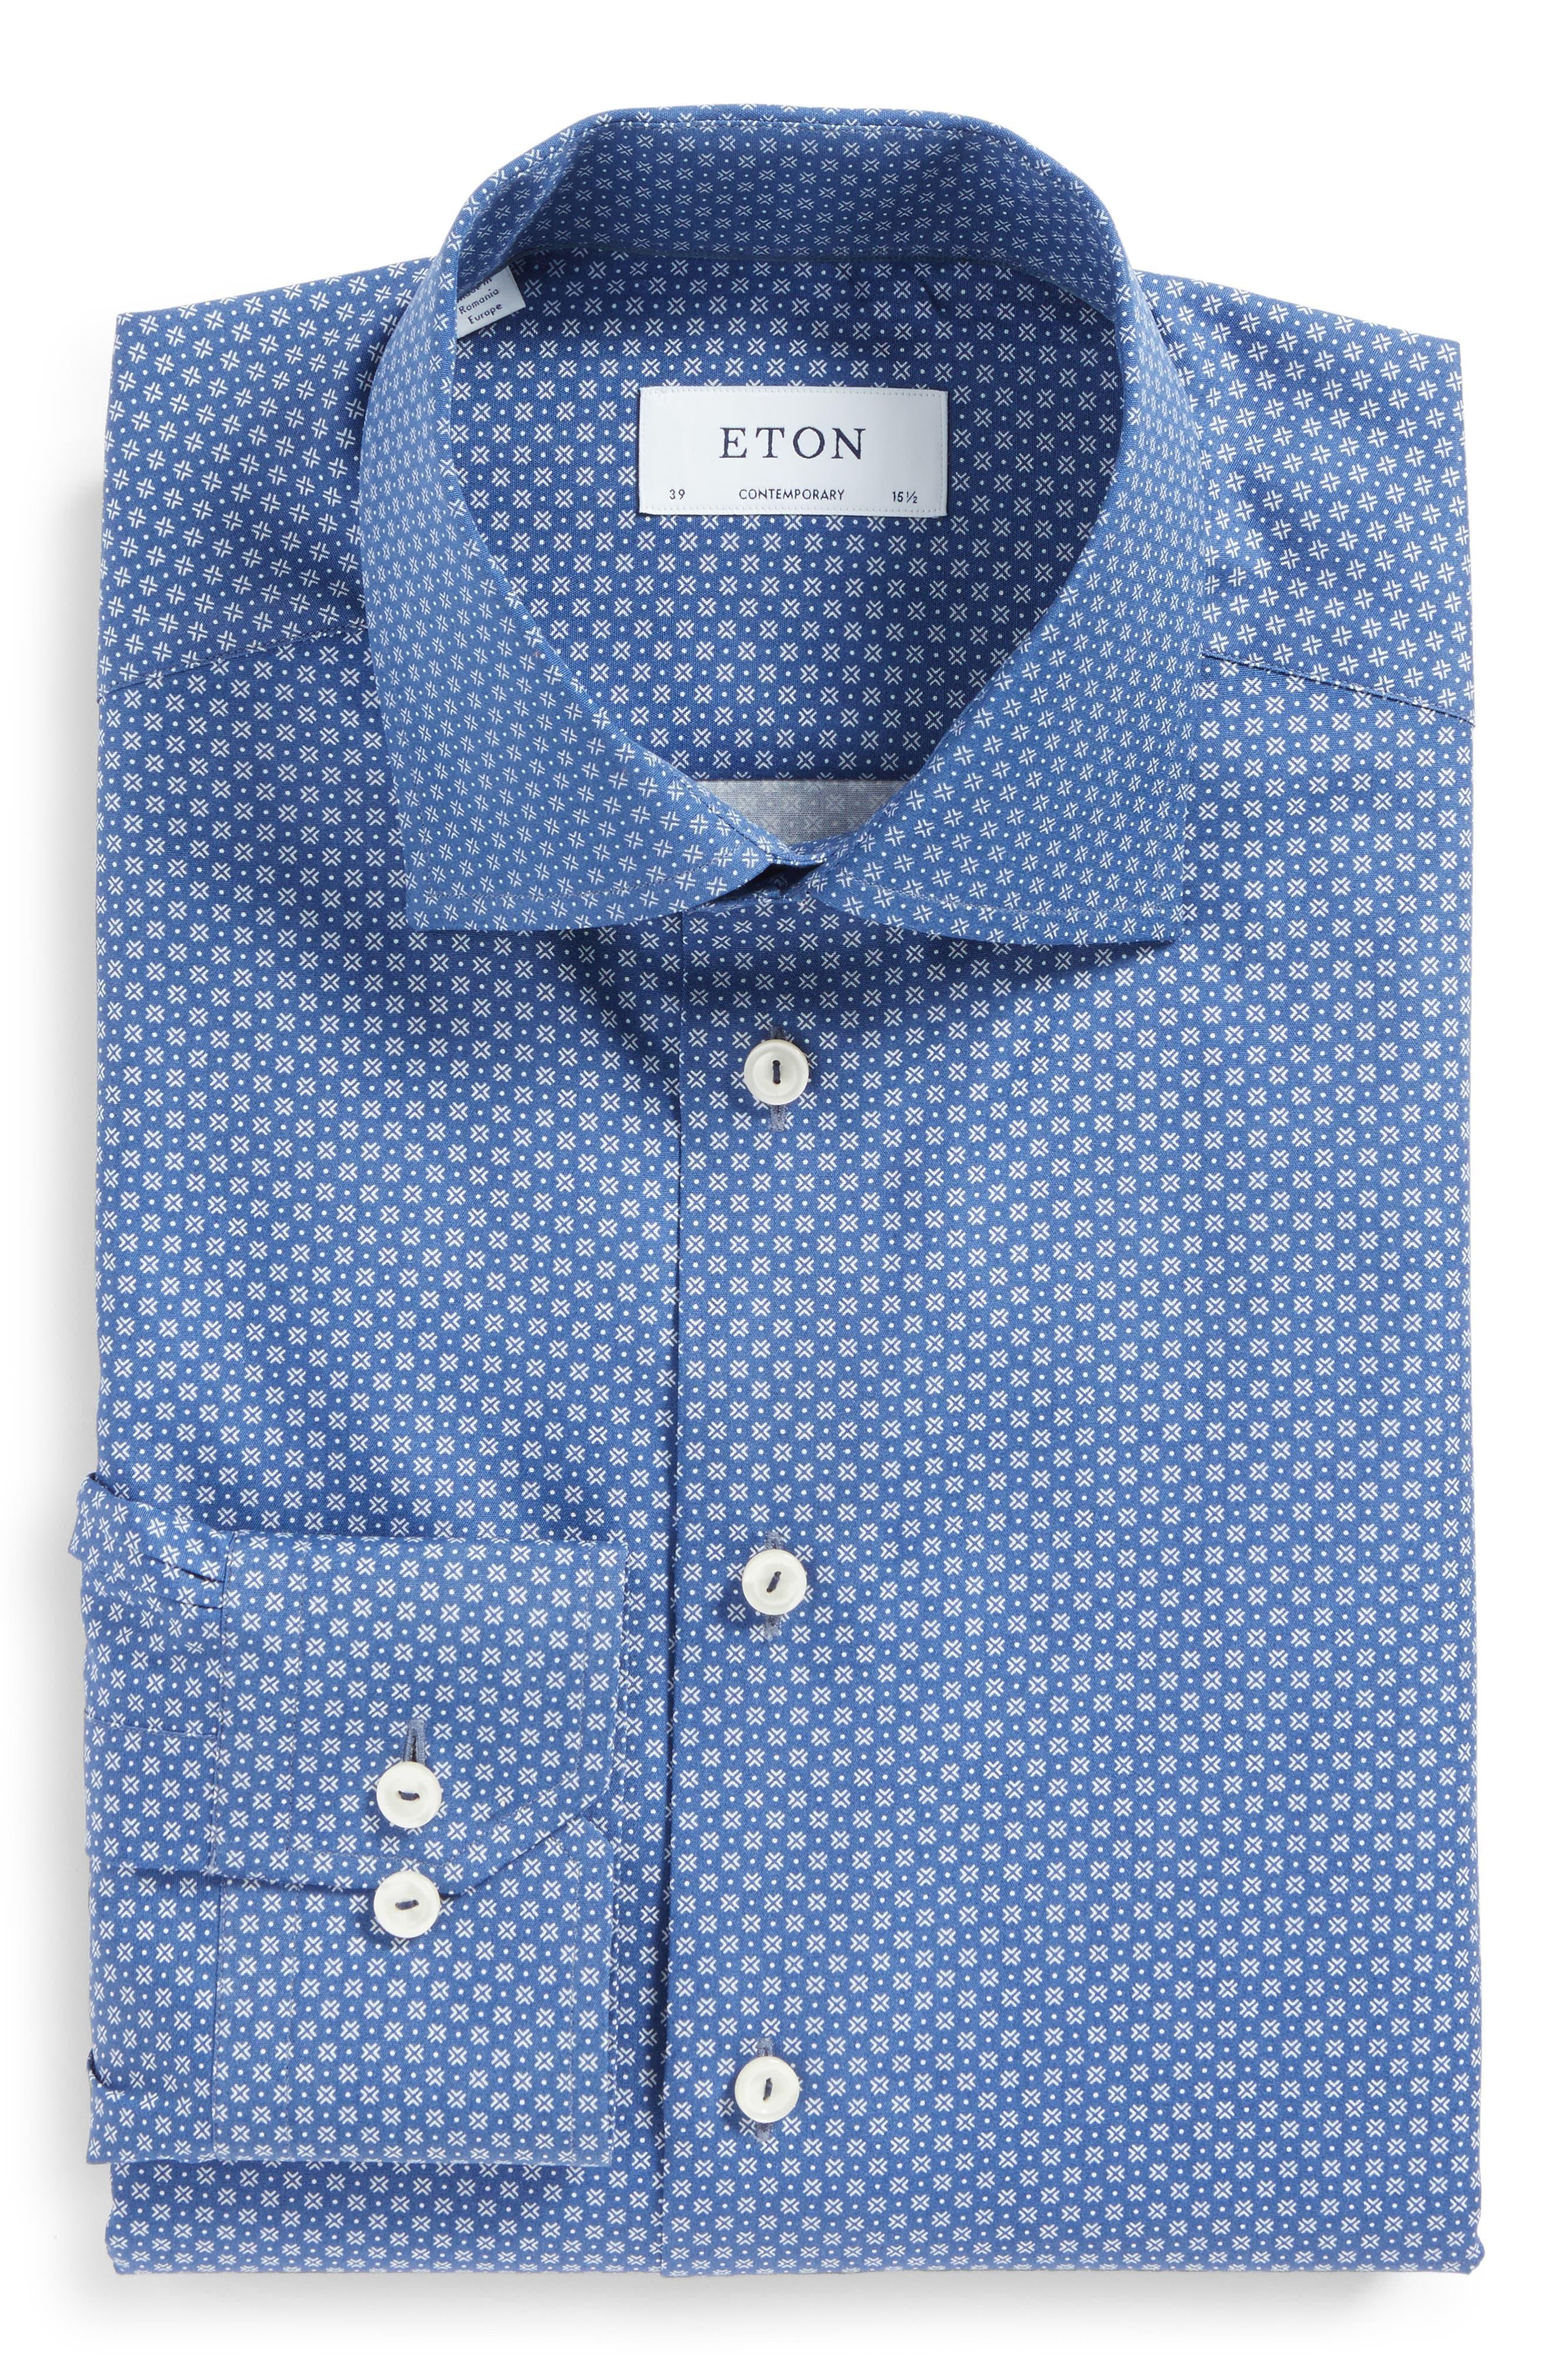 Alternate Image 1 Selected - Eton Contemporary Fit Geometric Dress Shirt